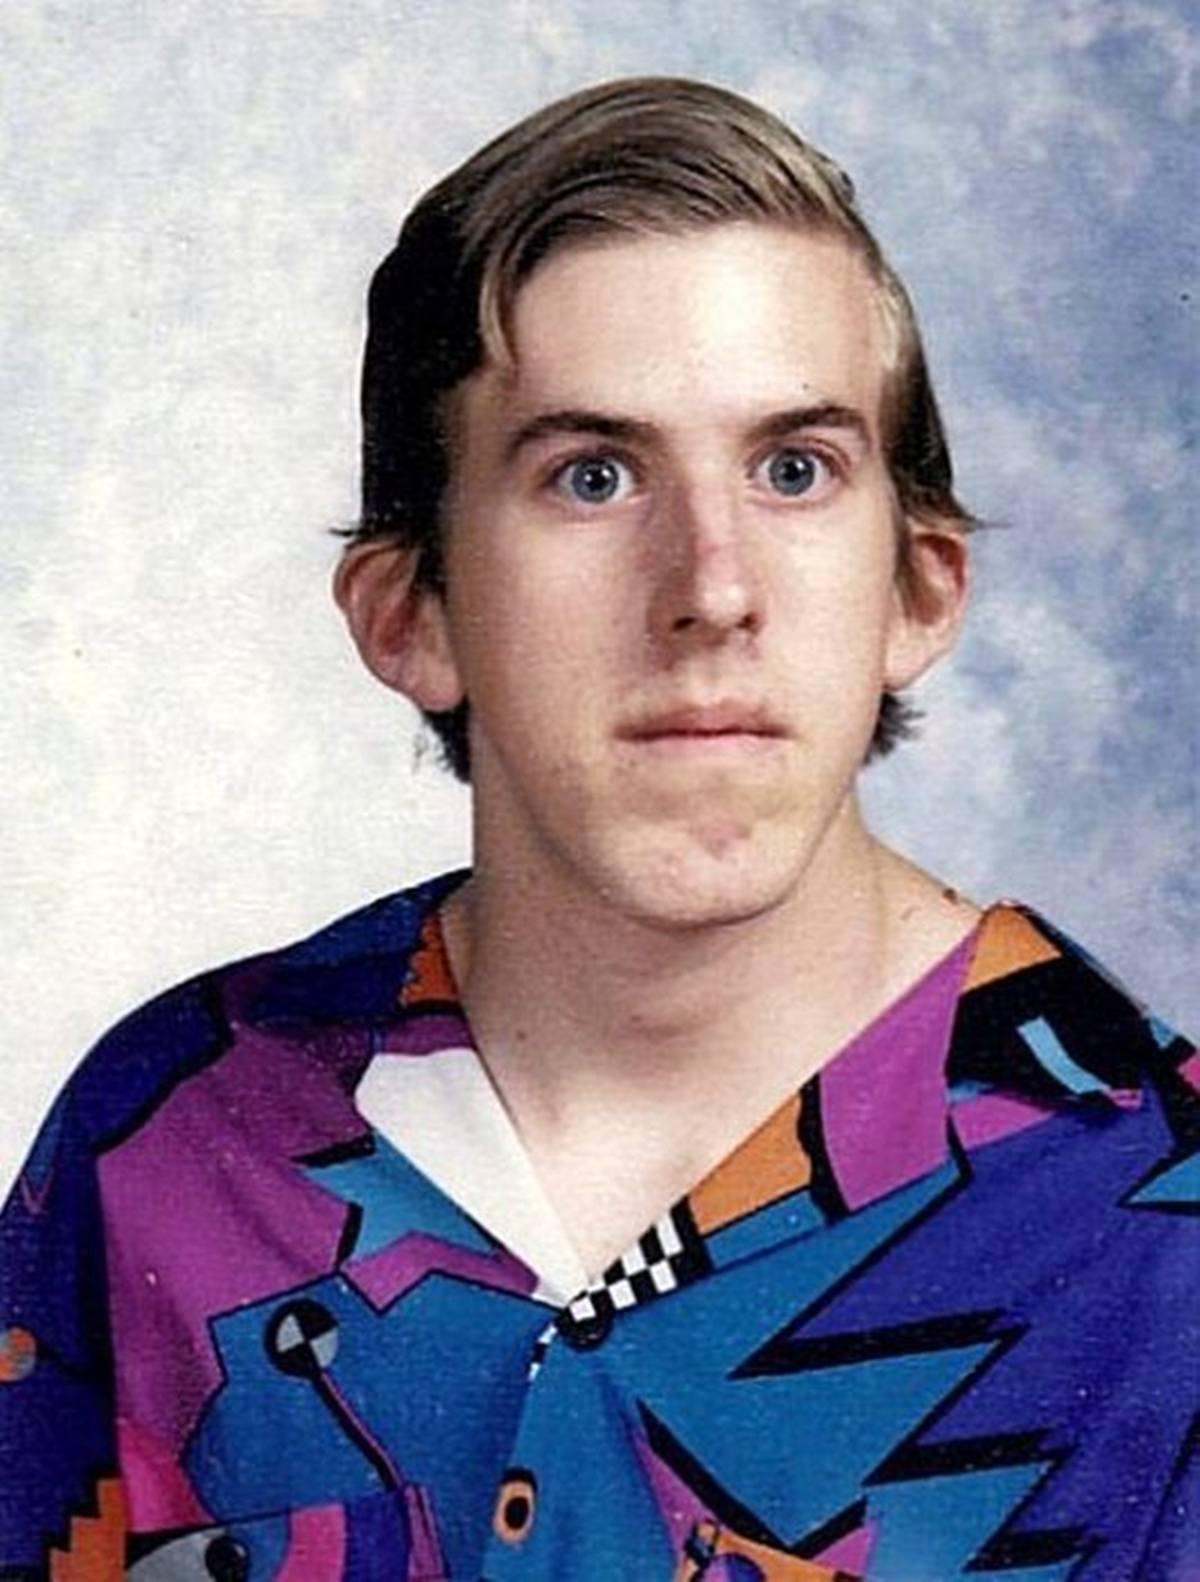 12 15 Hilariously Awkward Yearbook Photos